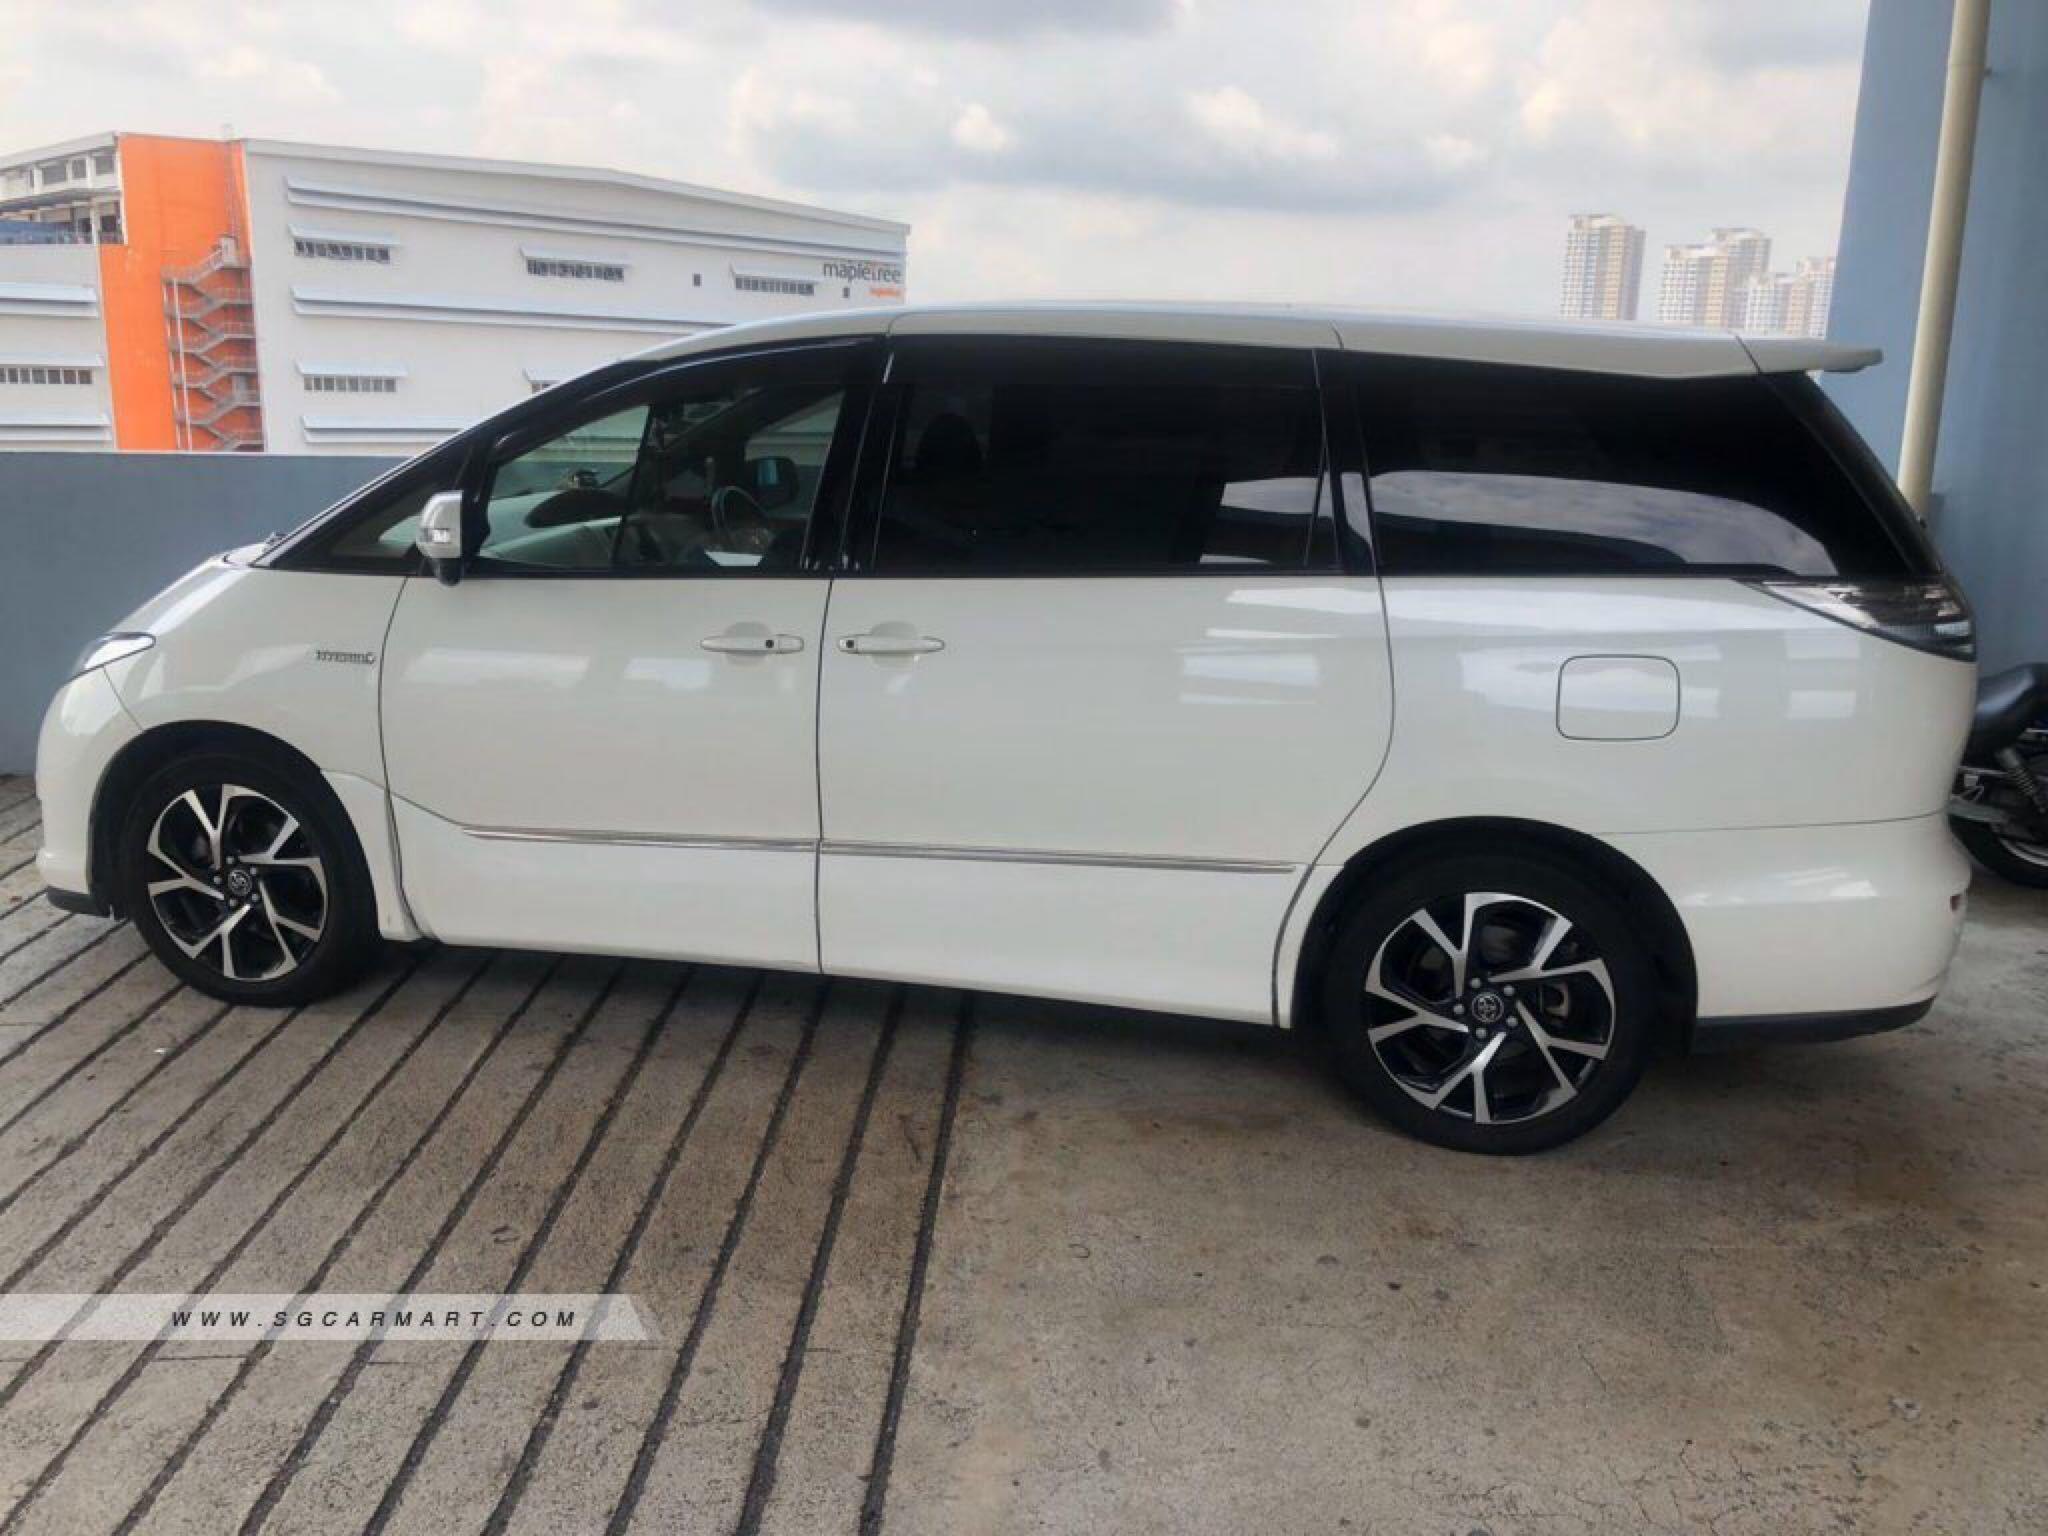 Toyota Estima Hybrid 2.4 X Auto